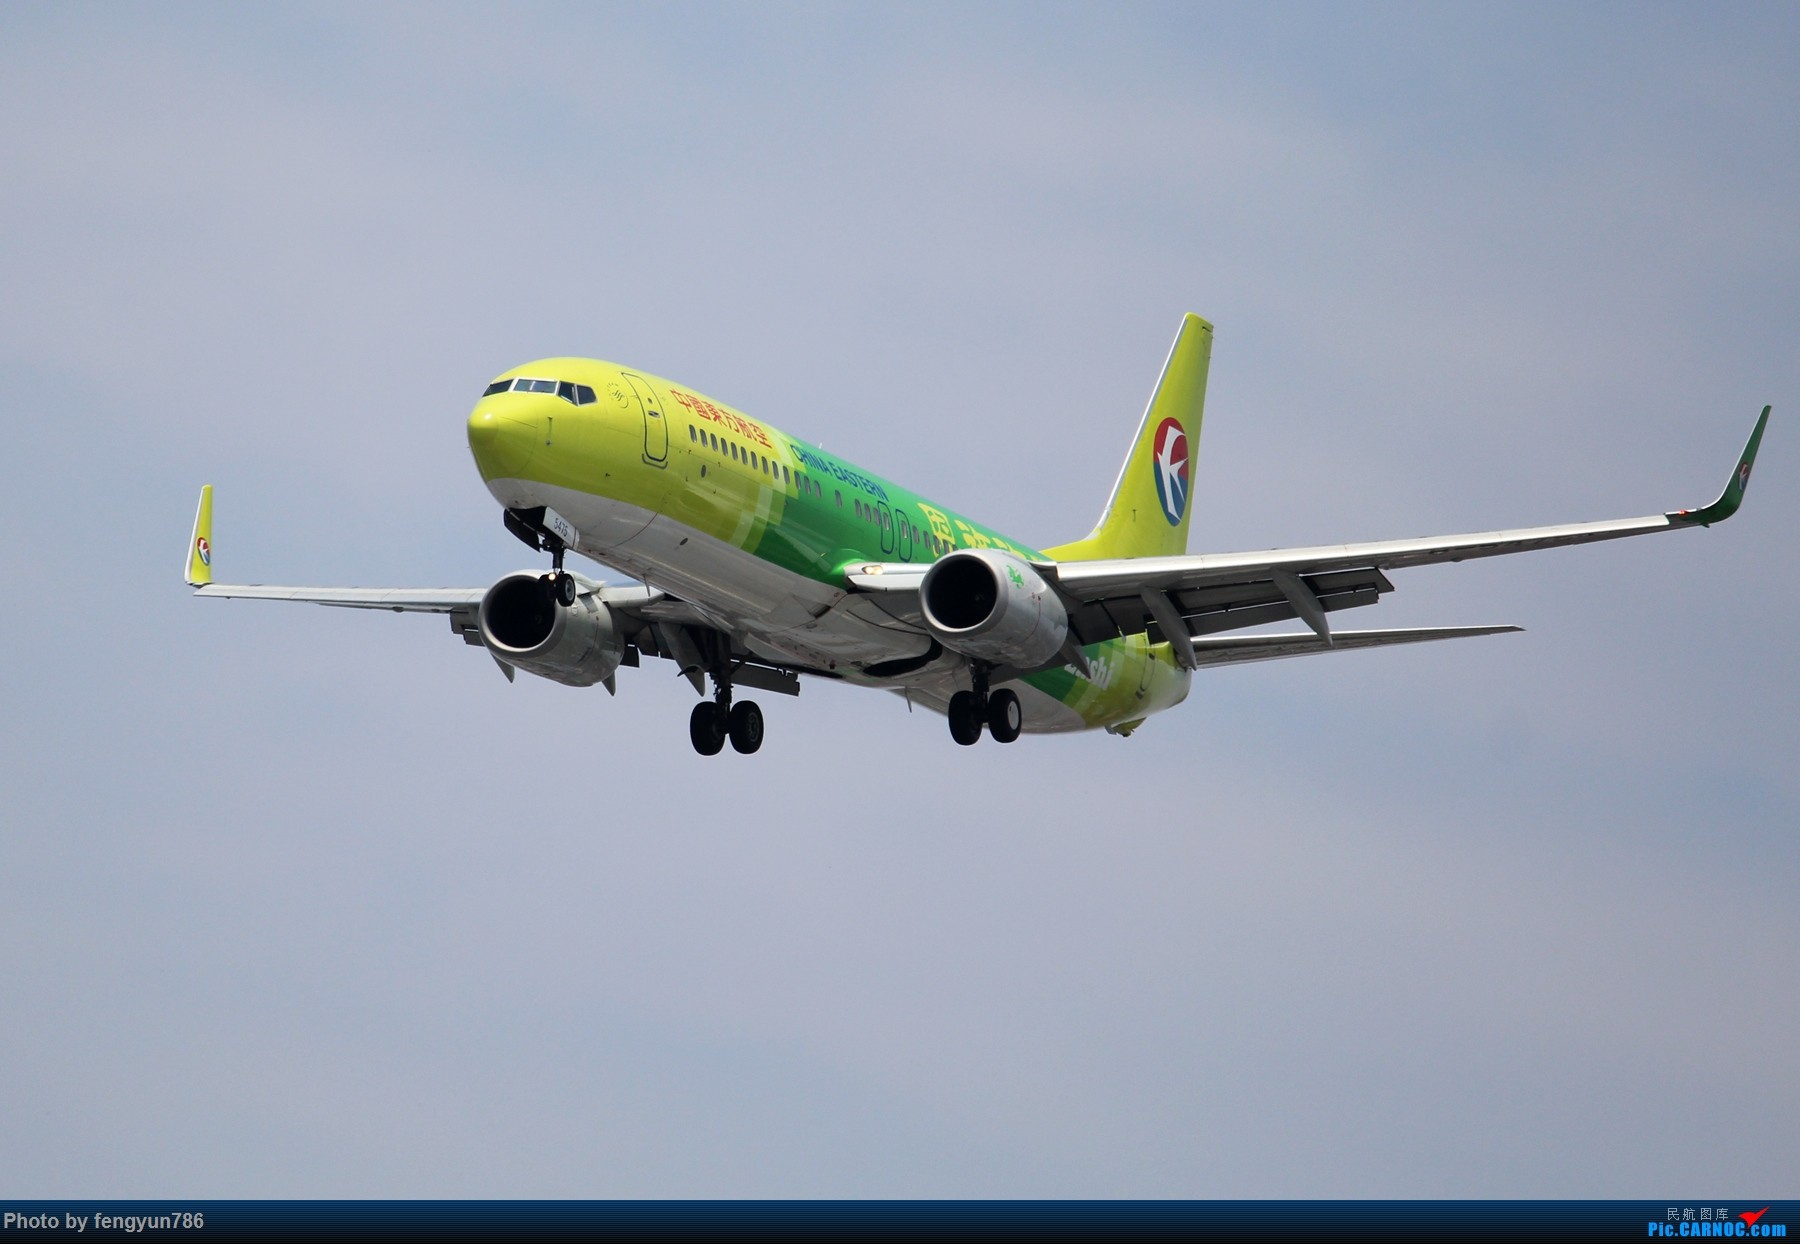 Re:[原创]7.19的SHA,天晴温高,发几个跟前一天不一样的。 BOEING 737-800 B-5475 中国上海虹桥国际机场